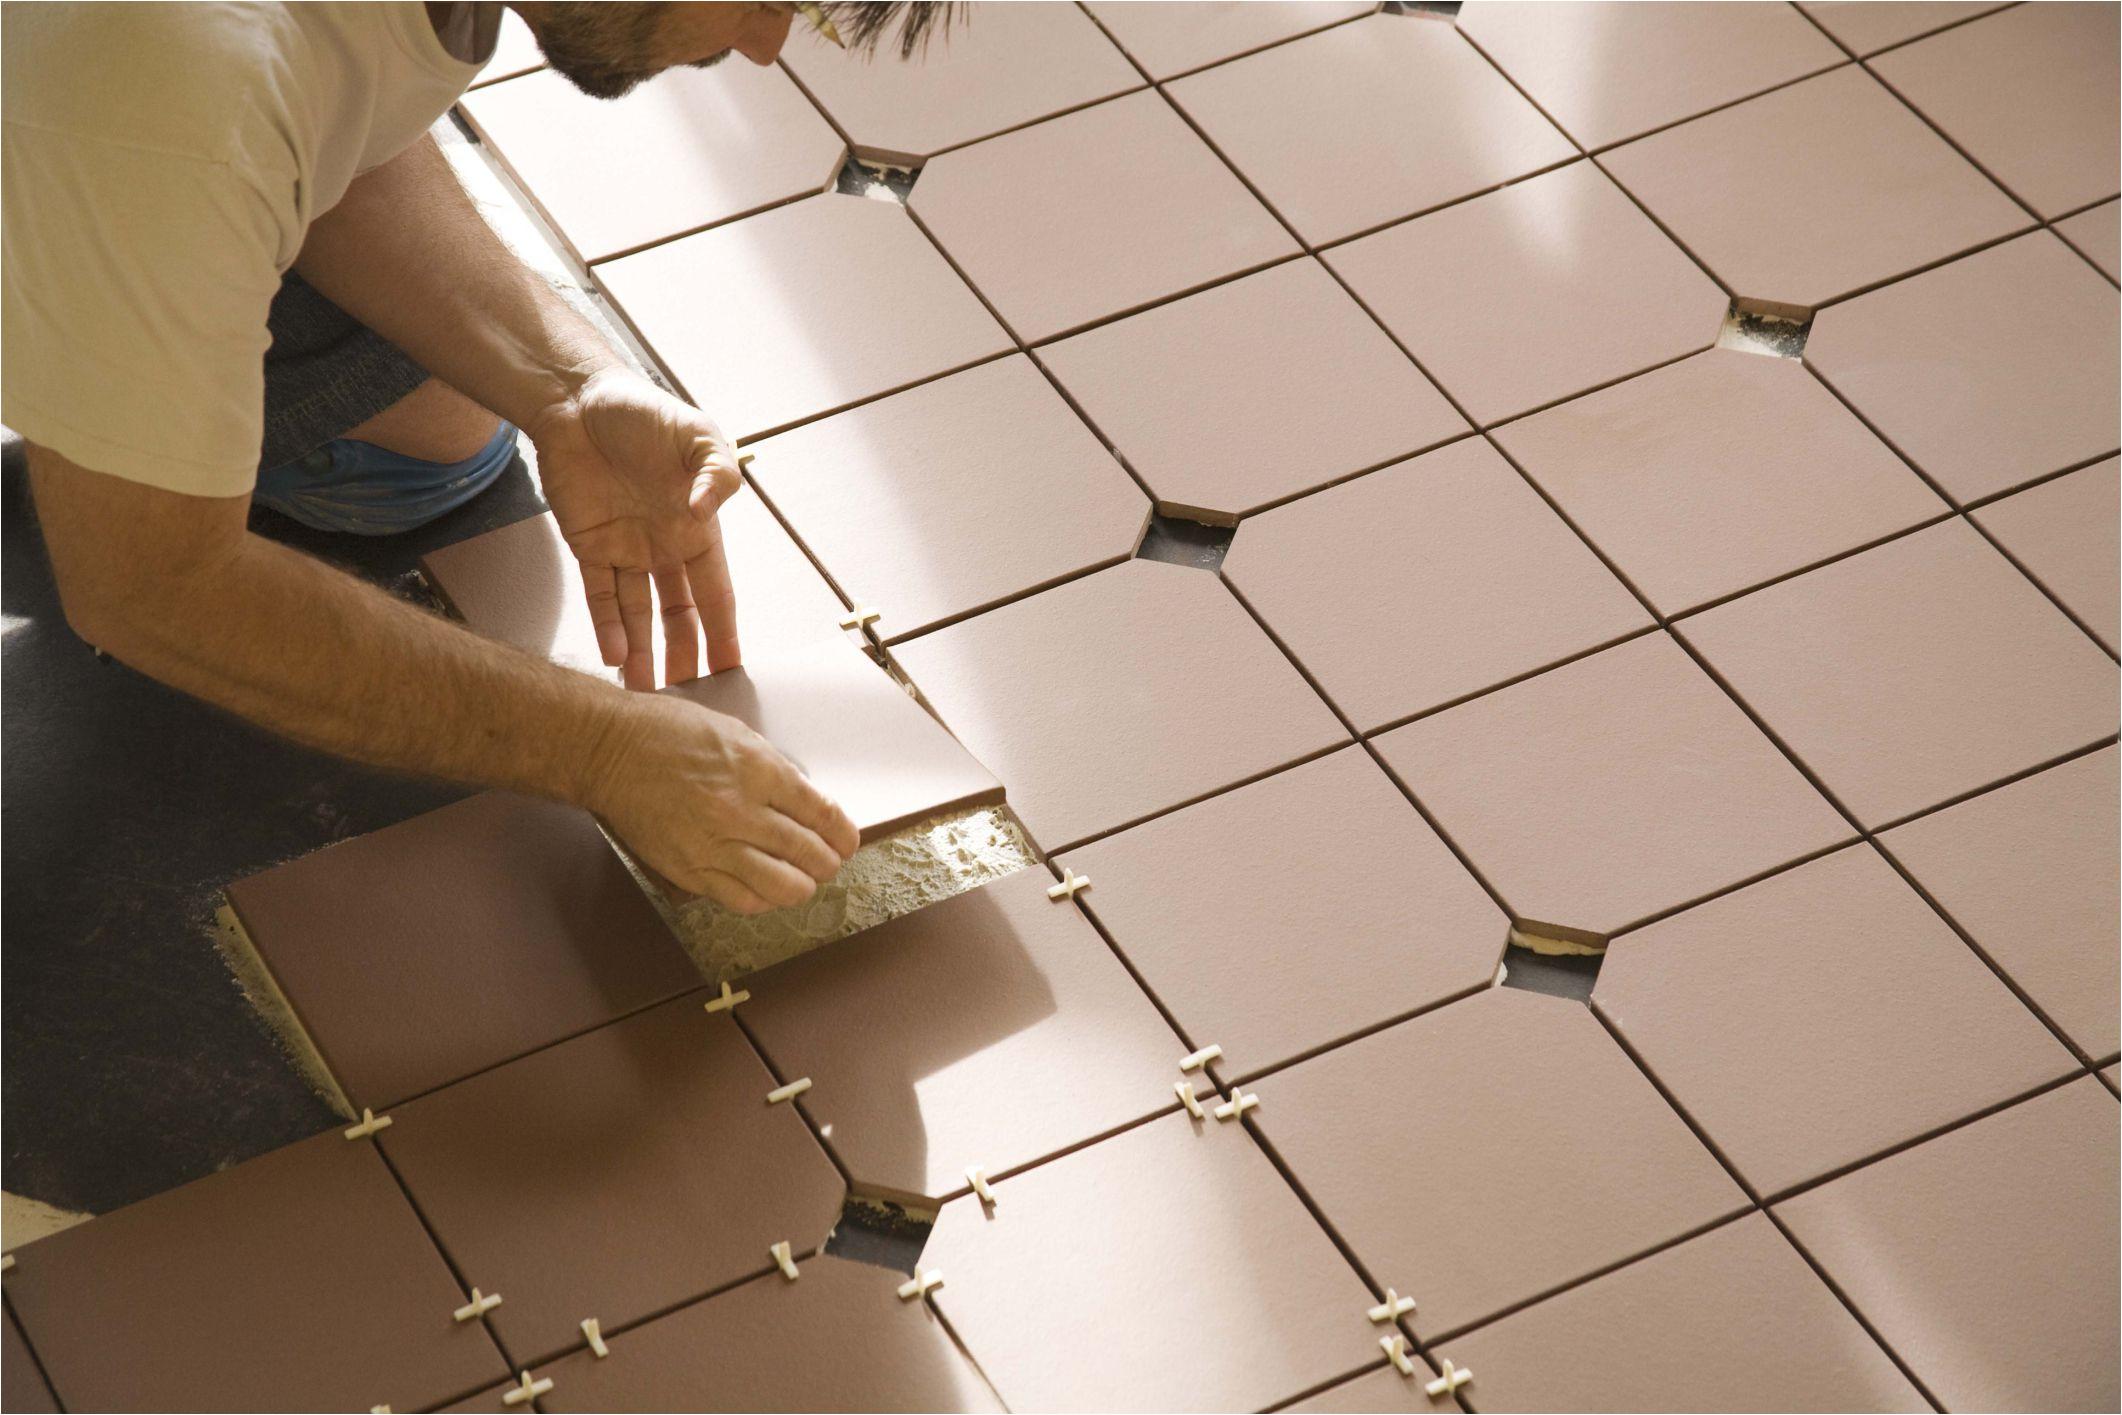 installing ceramic floor tile 86464768 56a4a0555f9b58b7d0d7e391 jpg